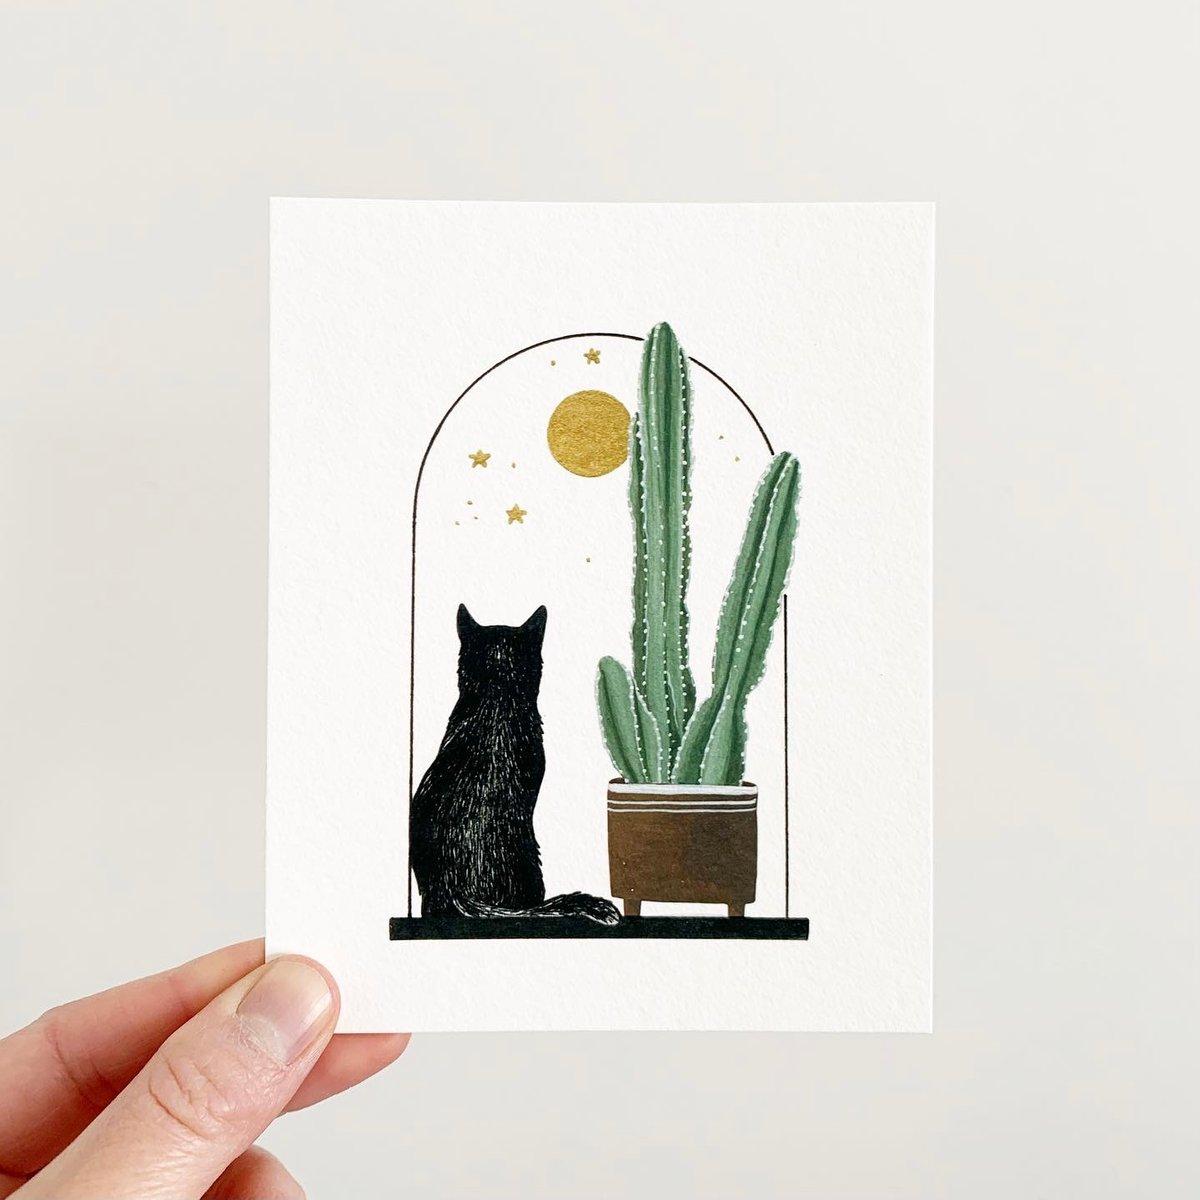 Image of Cats + Plants: Cereus Cactus